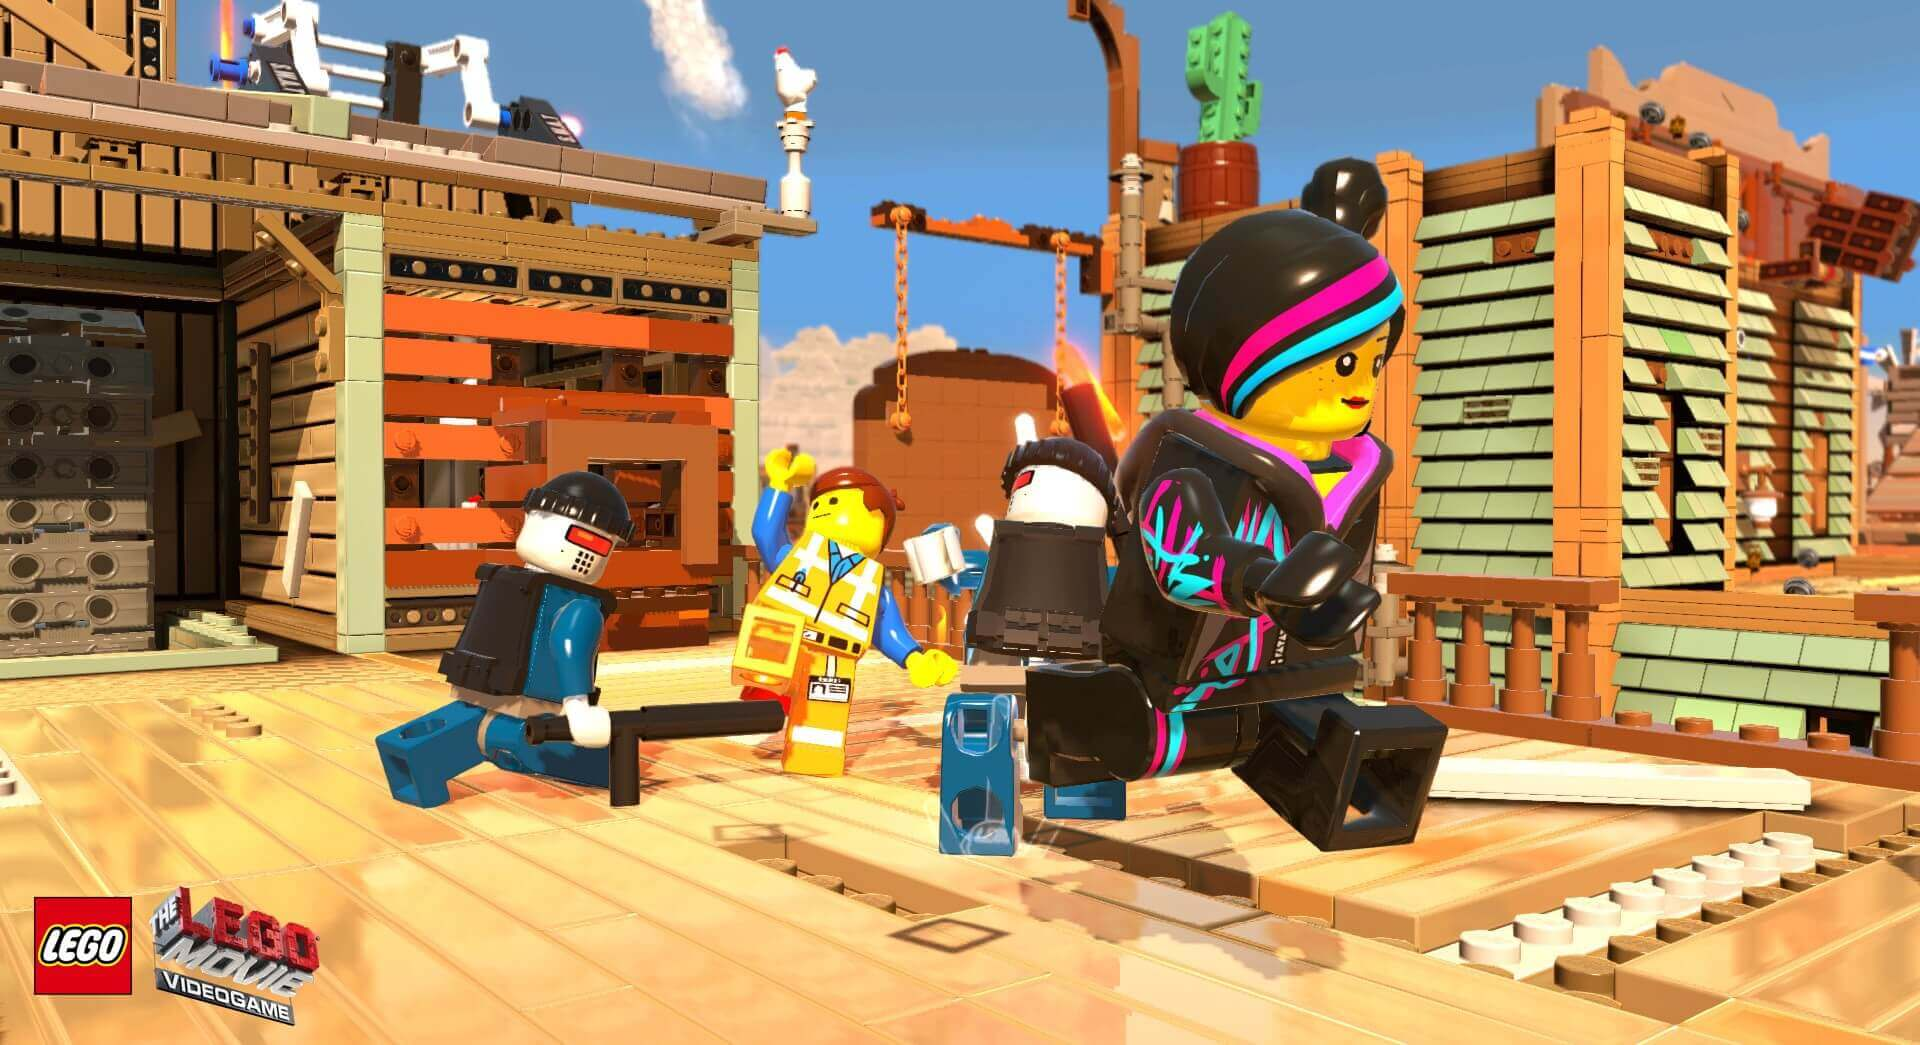 The LEGO Movie Videogame Essentials